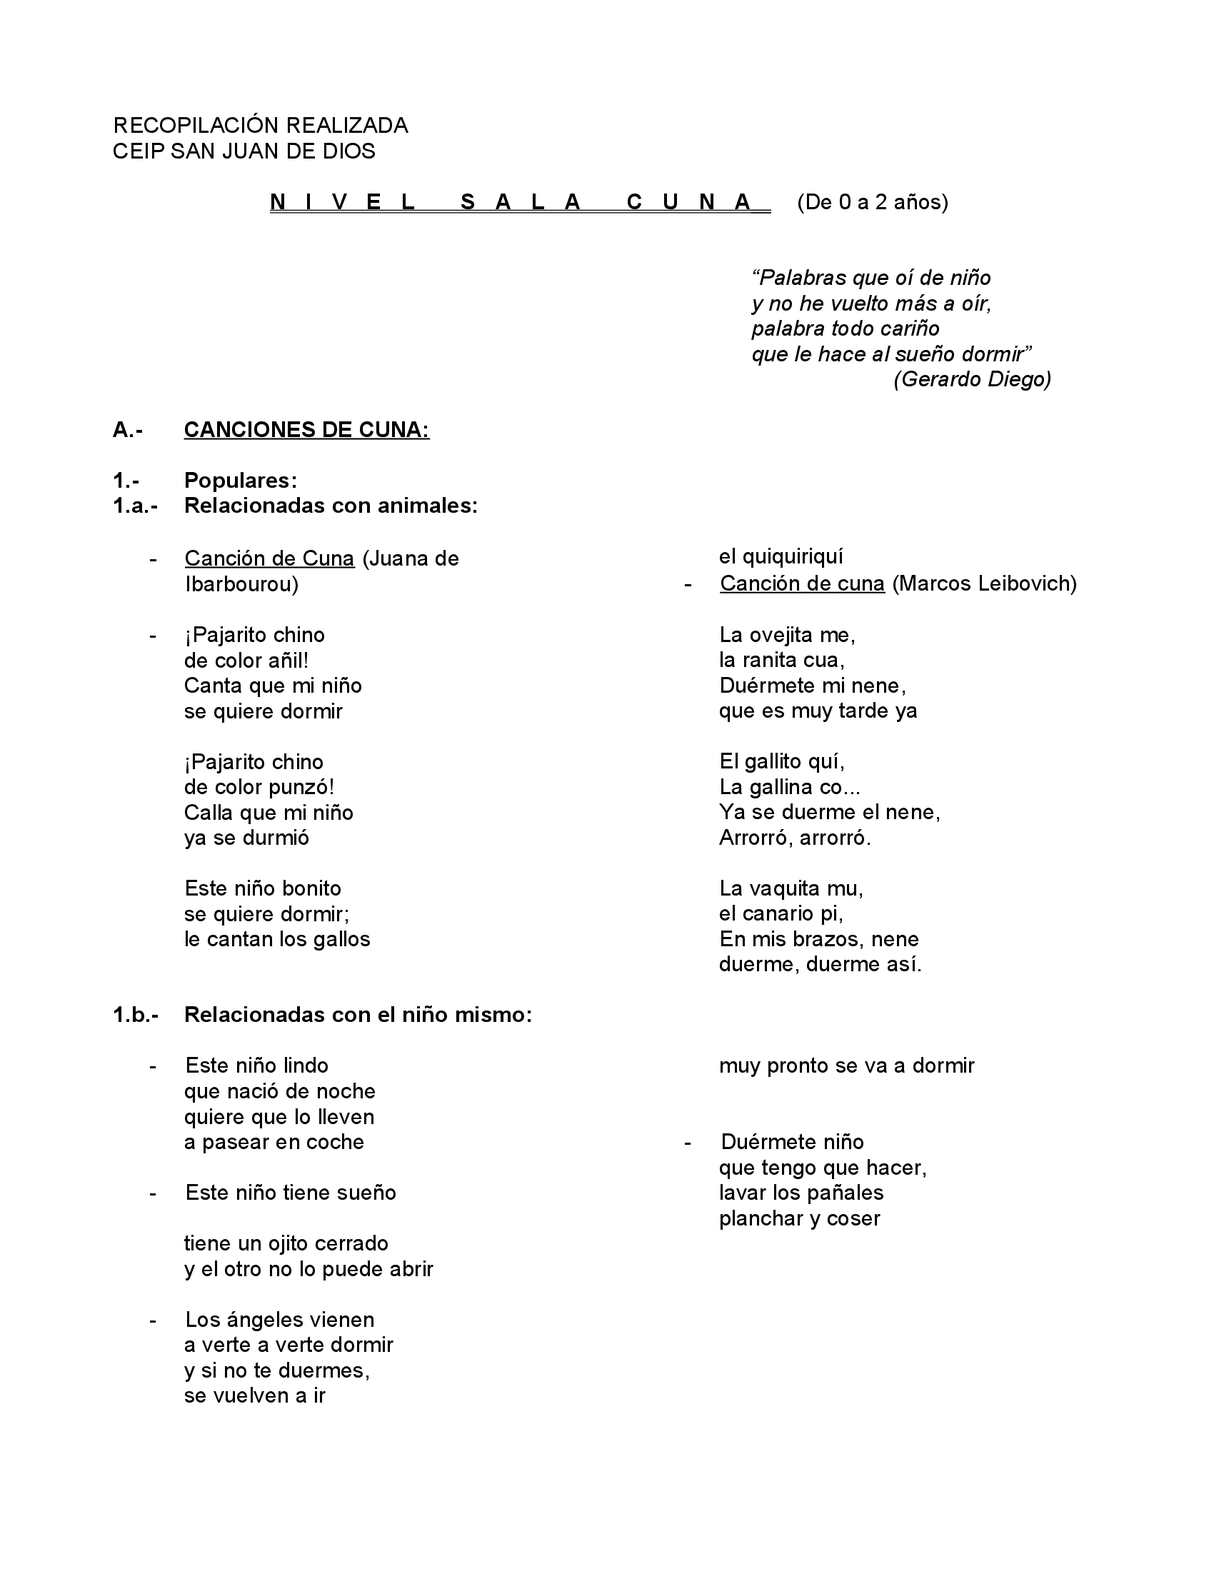 Poema al denudo - 1 9